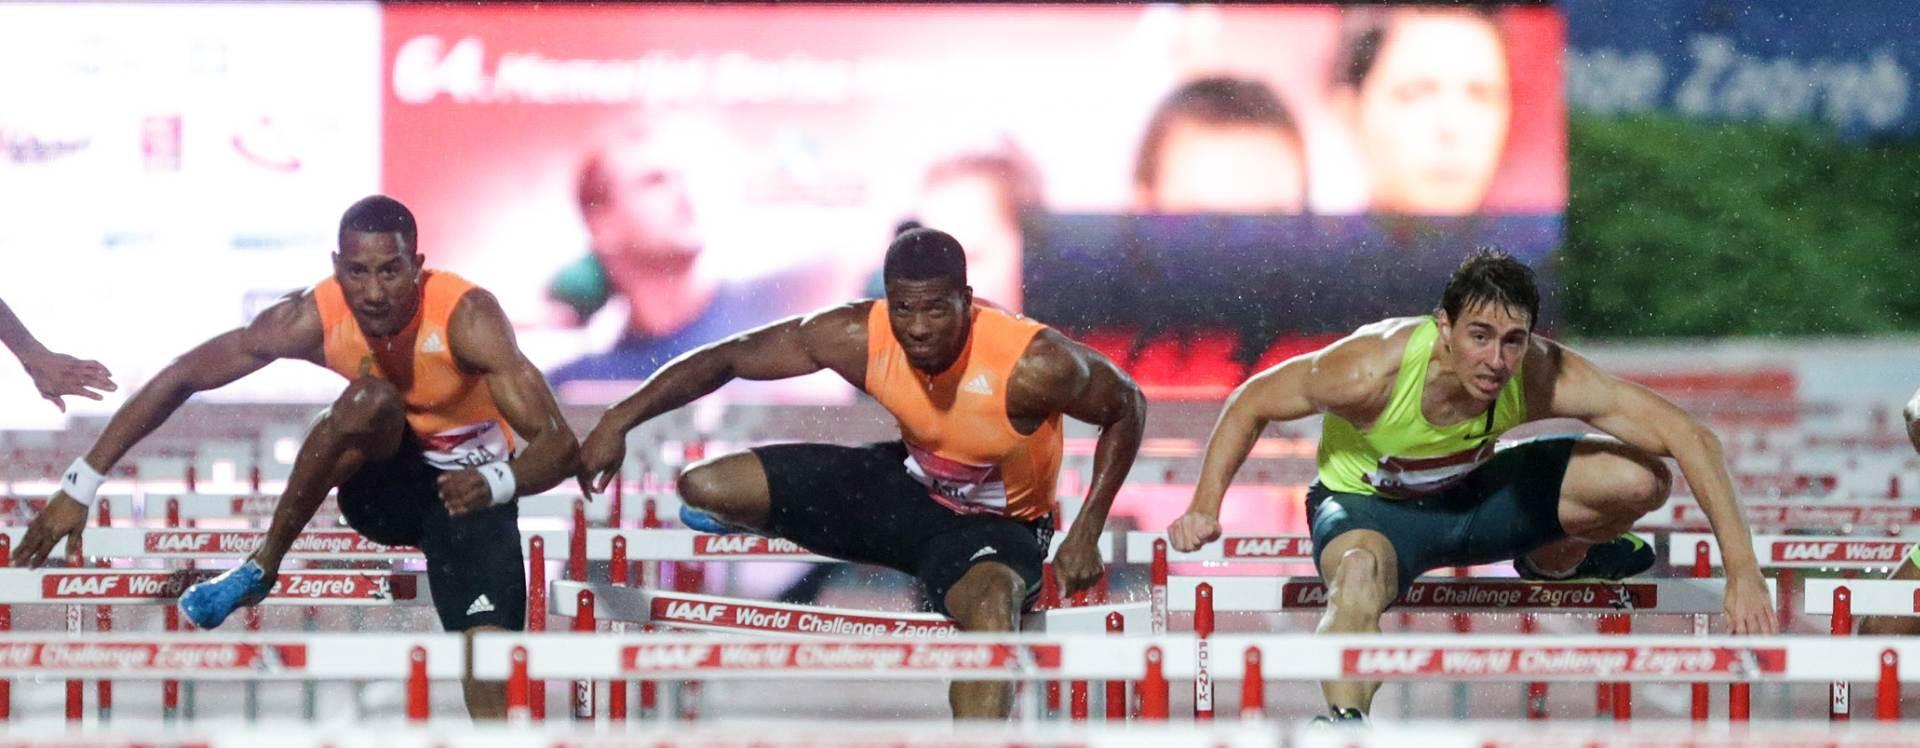 Olimpijski prvak Merritt mora na transplataciju bubrega